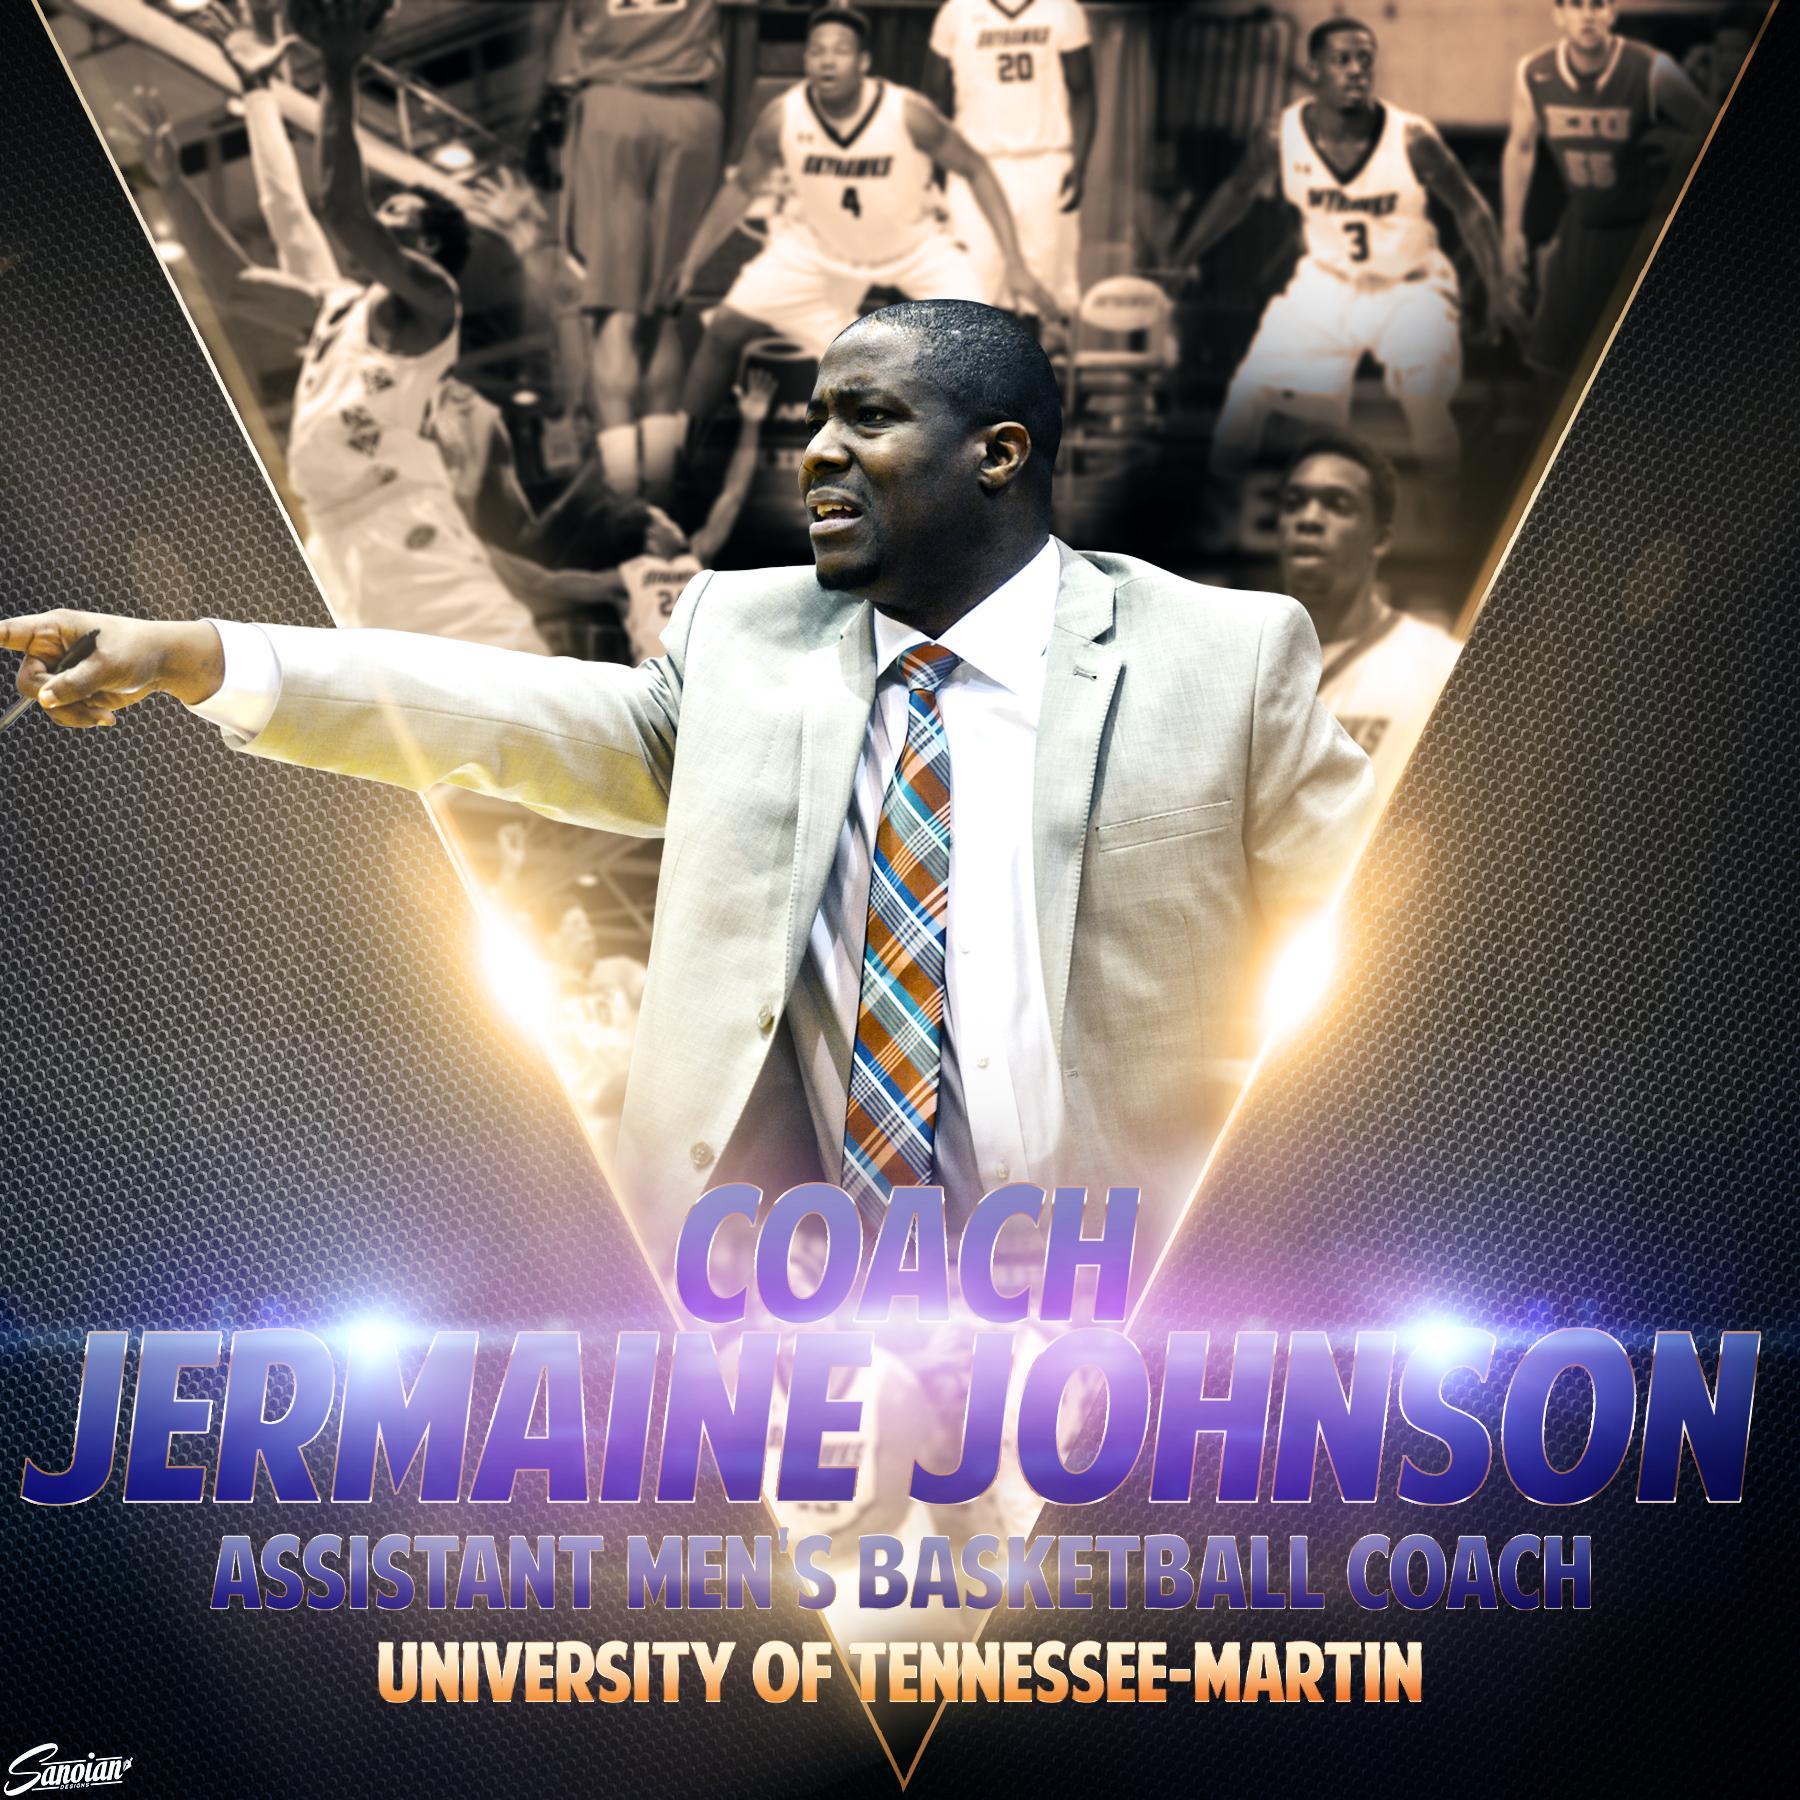 Coach Johnson - University of Tennessee-Martin Men's Basketball Assistant Coach